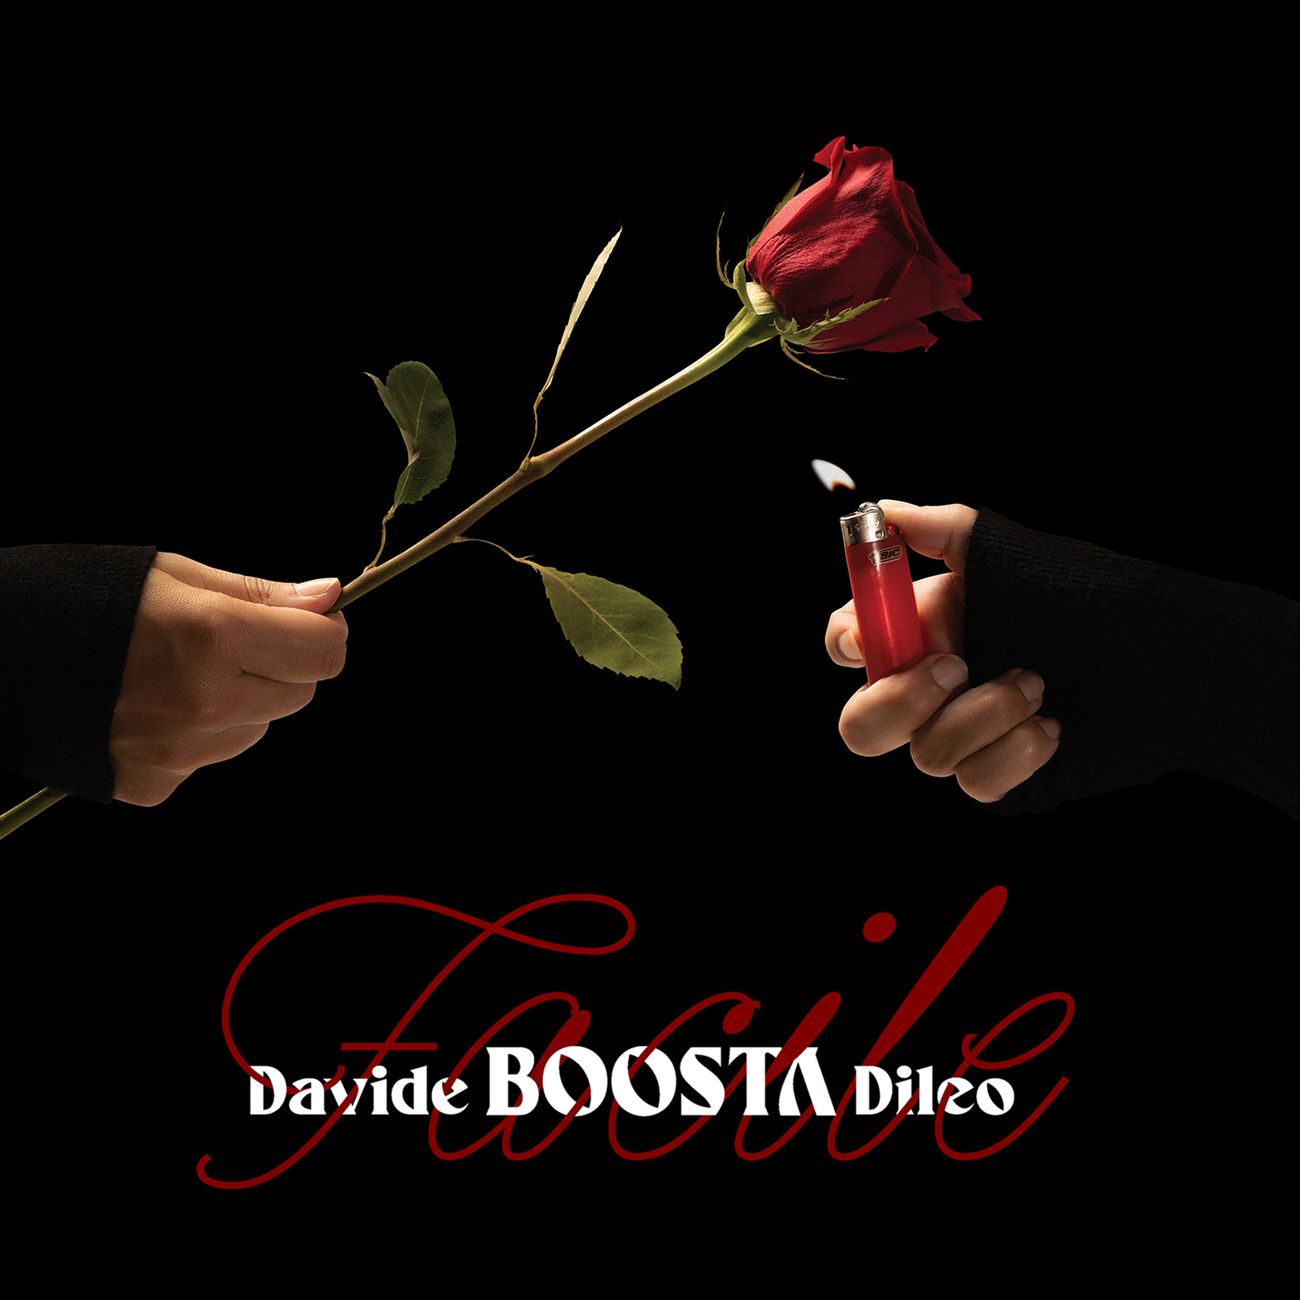 Davide Boosta Dileo - Facile (2020)